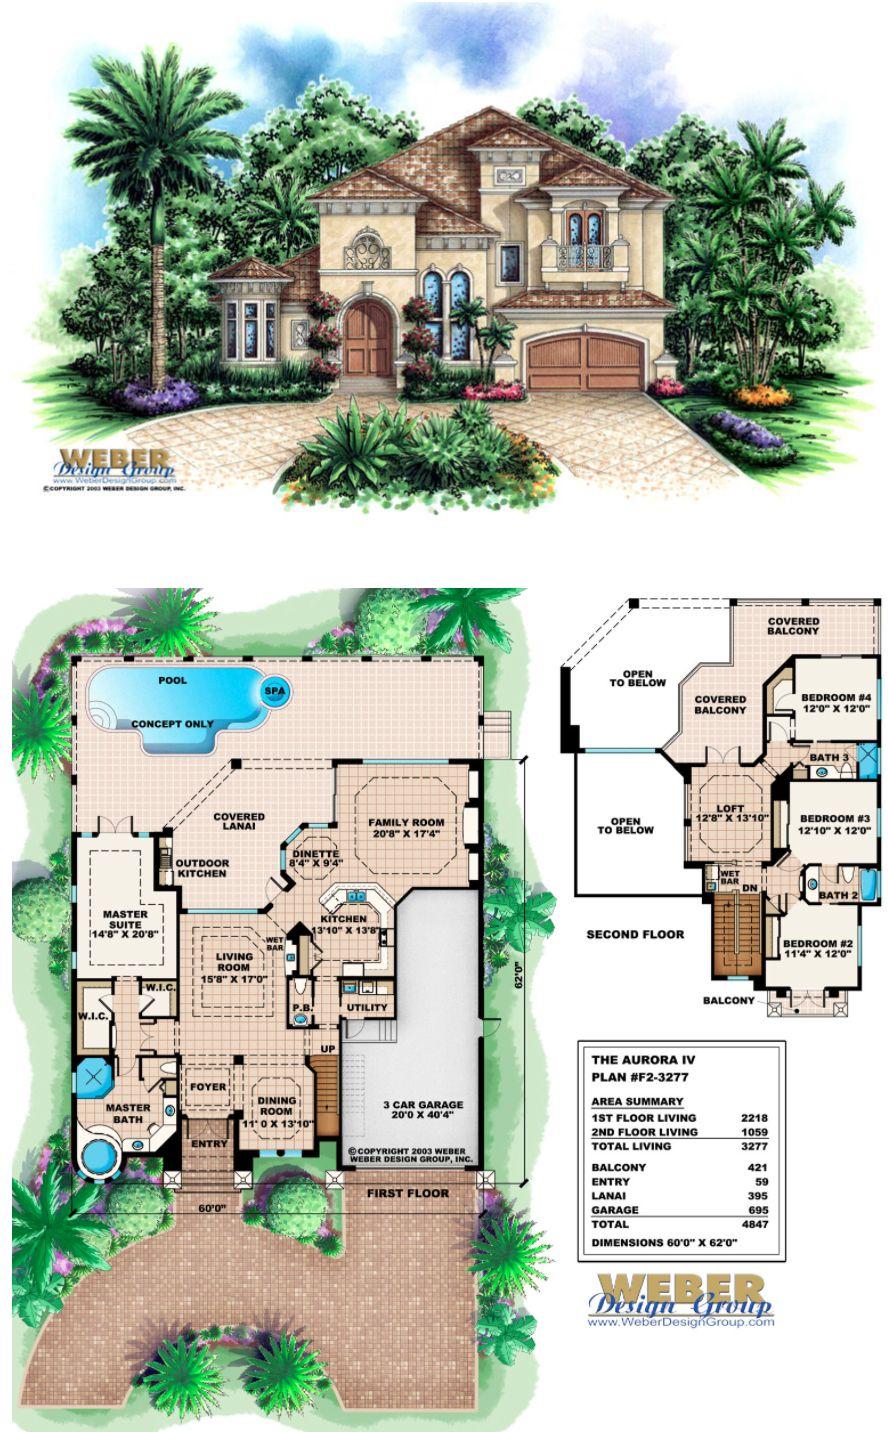 F2-3277 - Aurora IV - Two story Mediterranean house plan 4 Bedrooms, 3 full baths, 1 half bath, 3 car garage